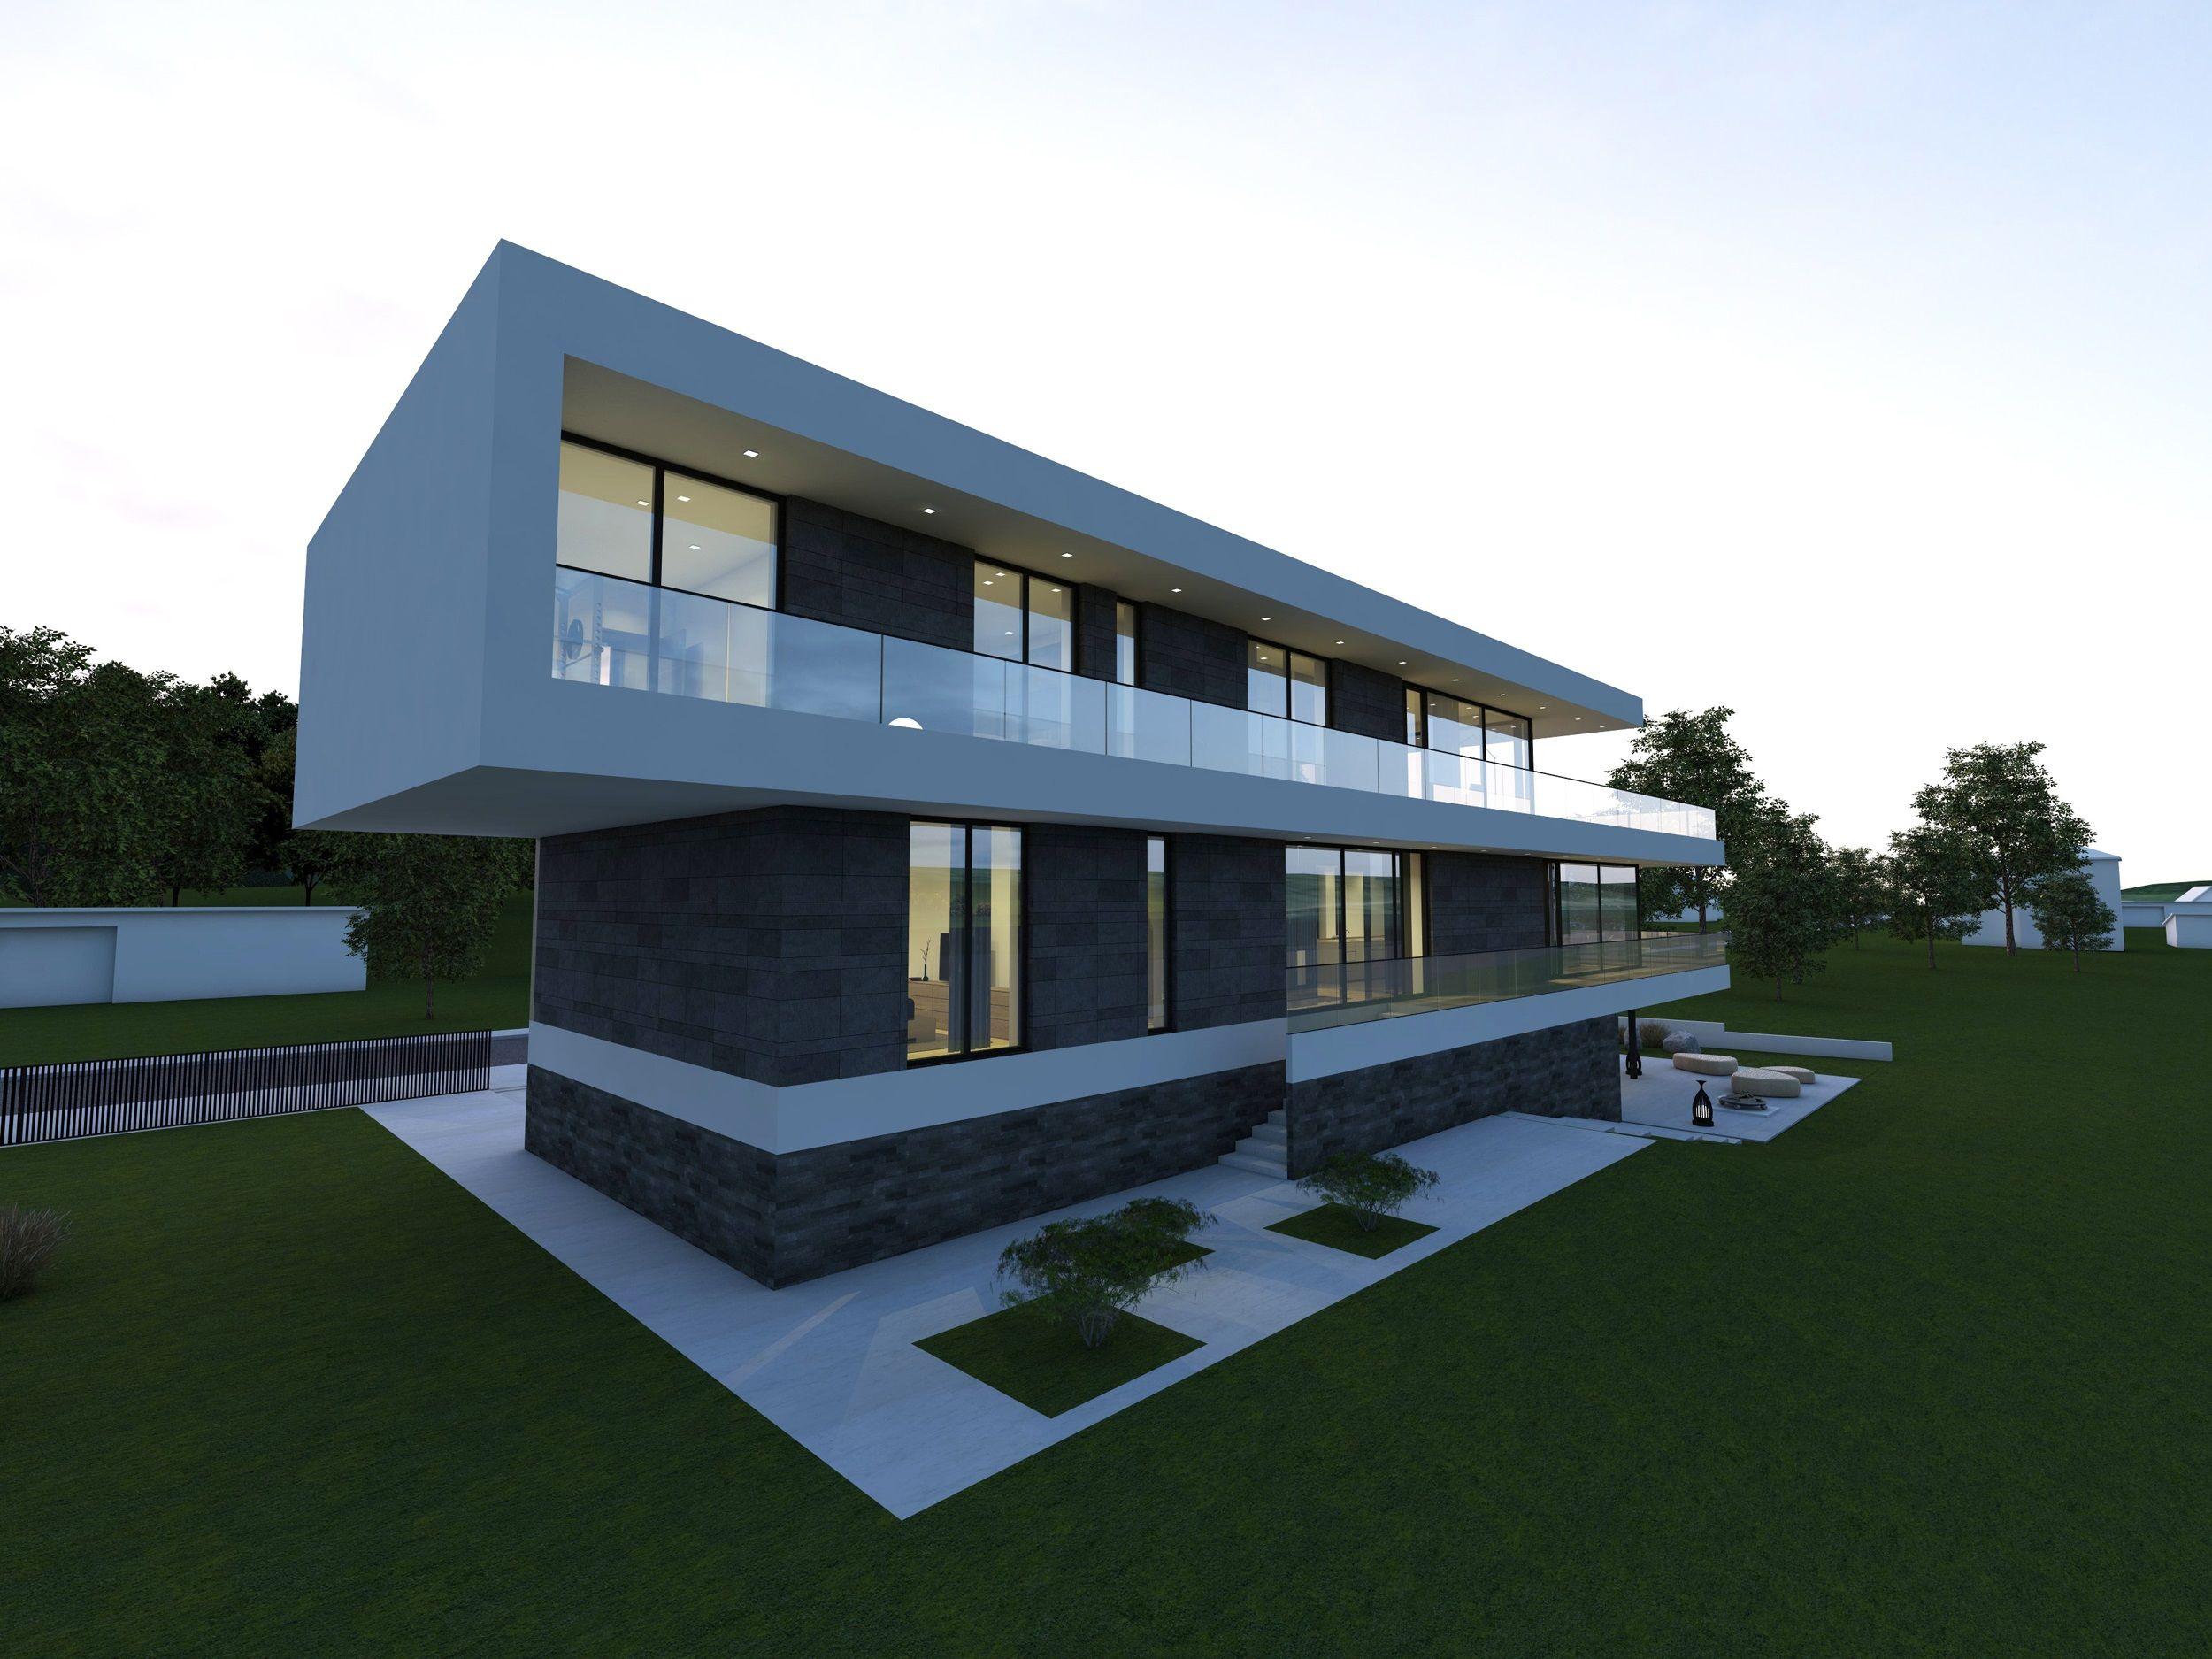 Architettura Case Moderne Idee villa g in kaunas, lithuania | interni